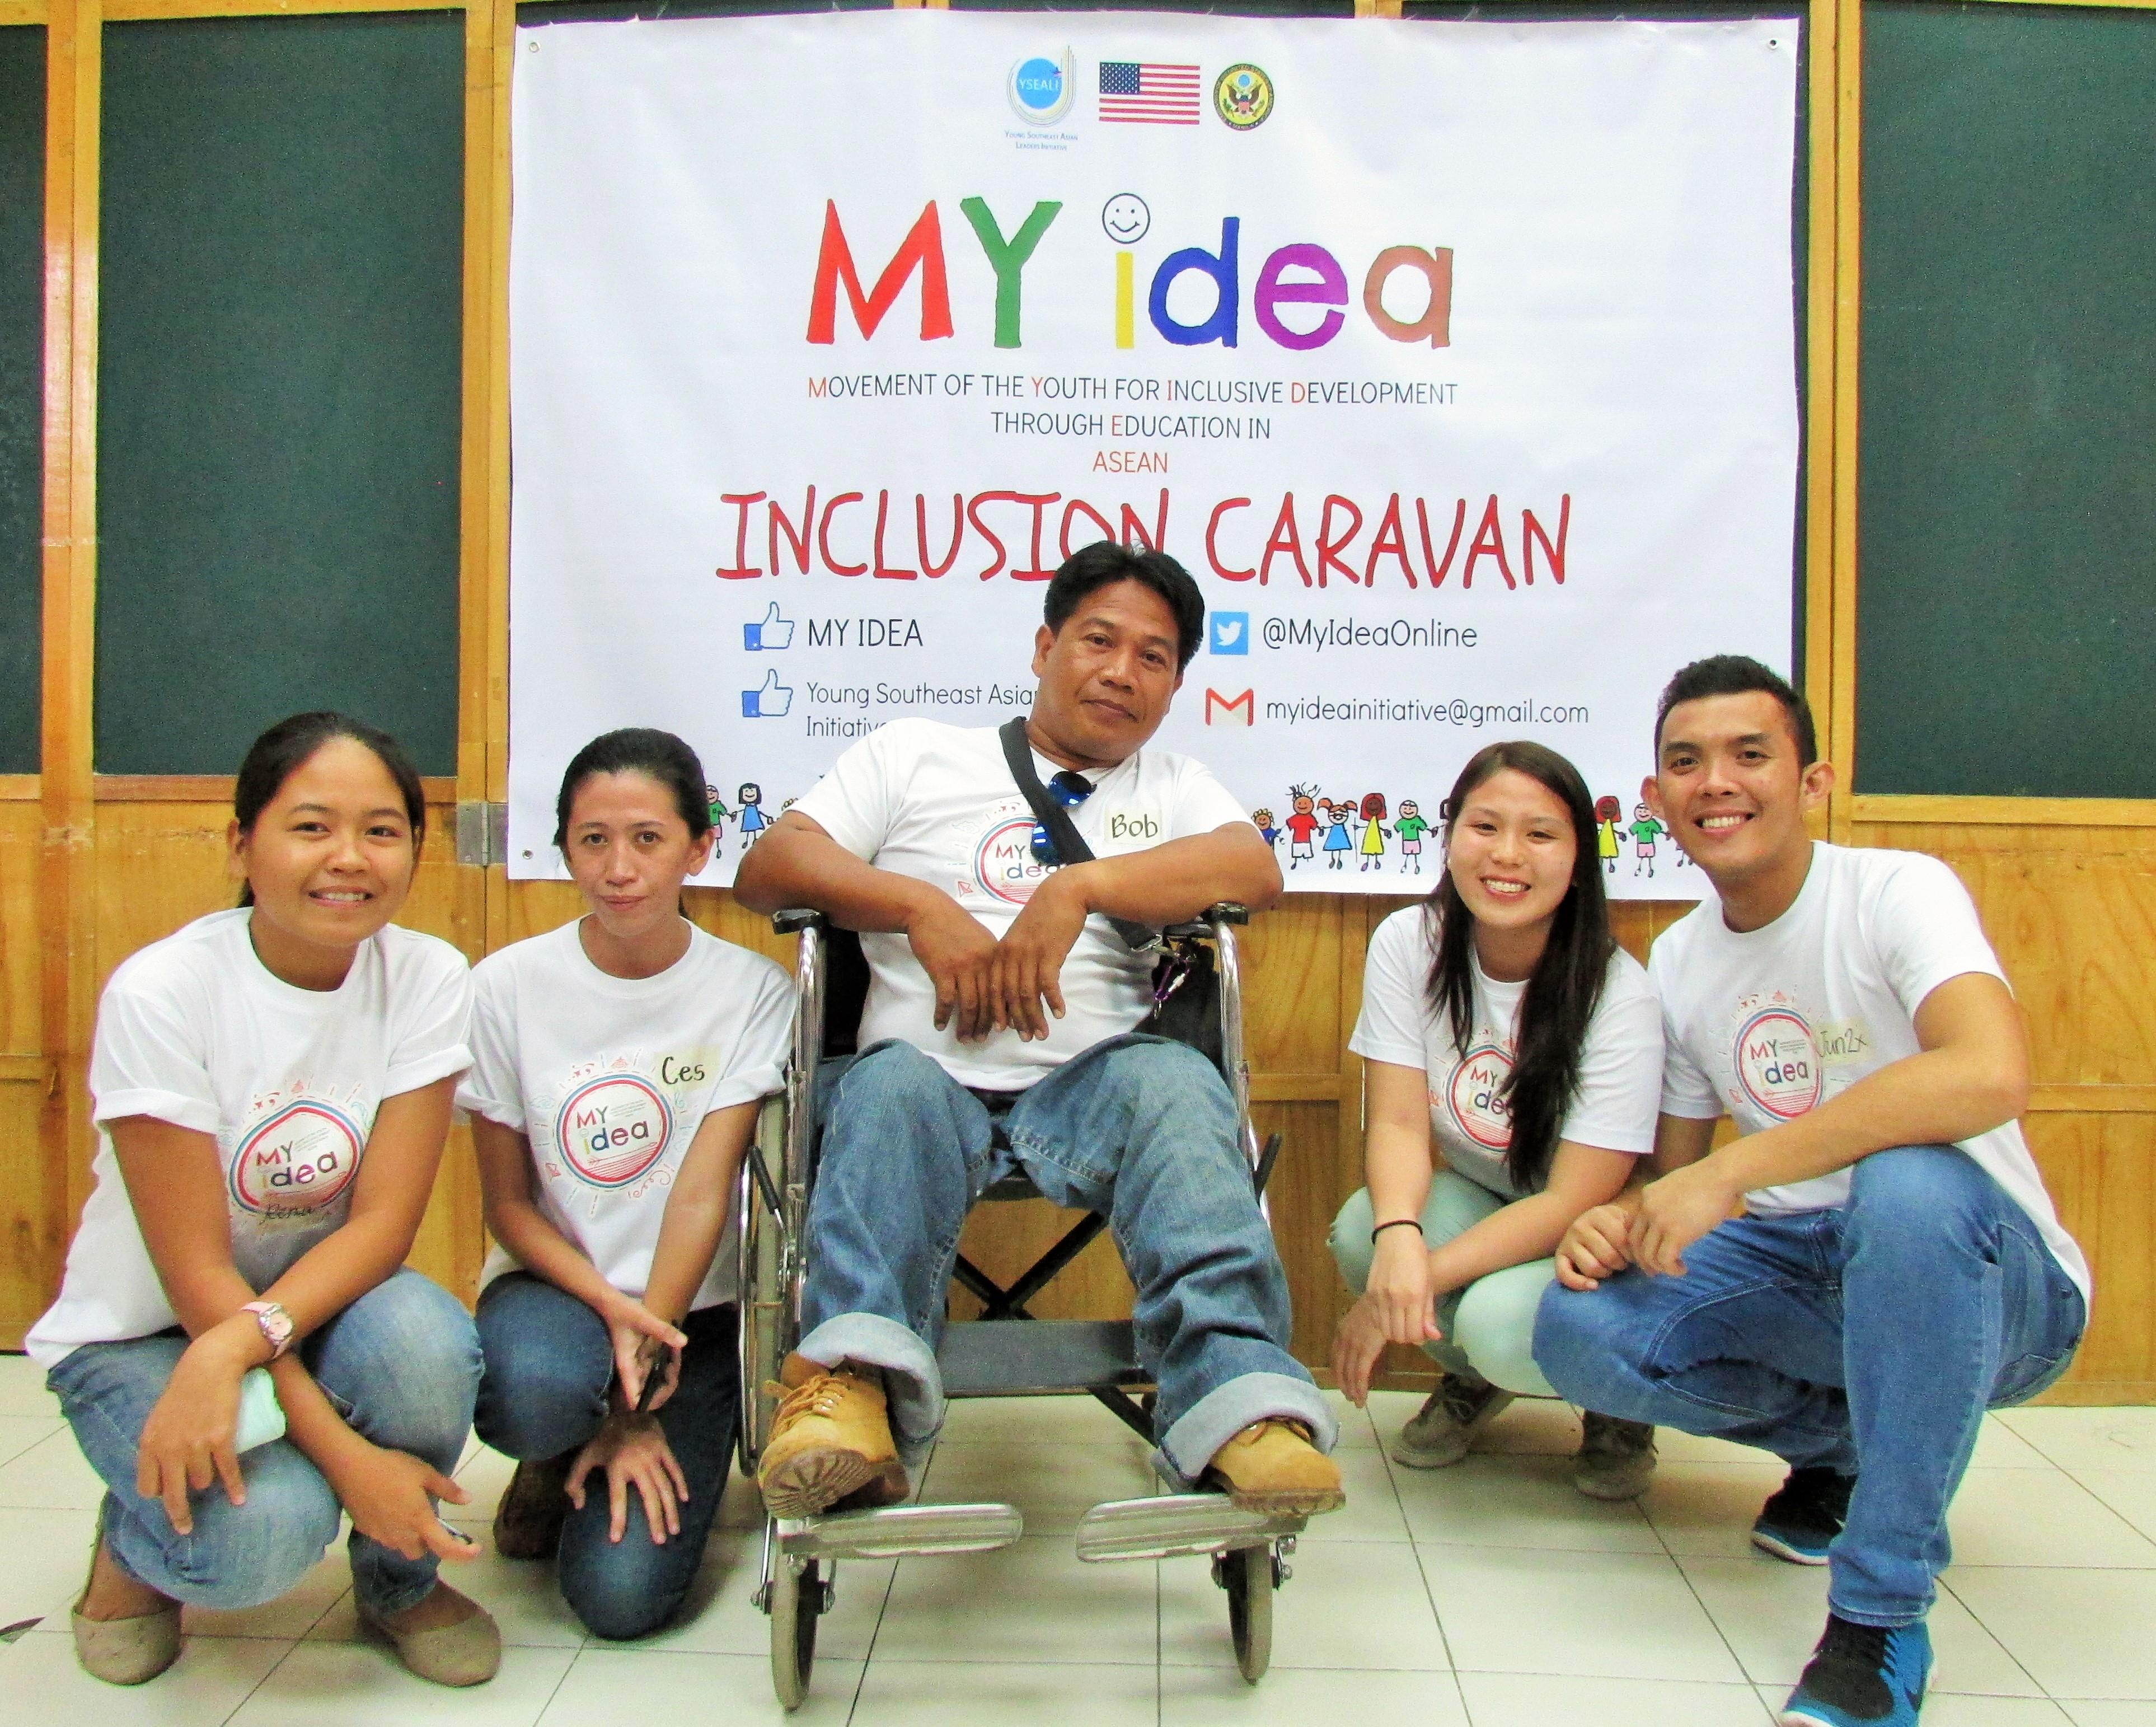 Phillipines clipart inclusive education #13